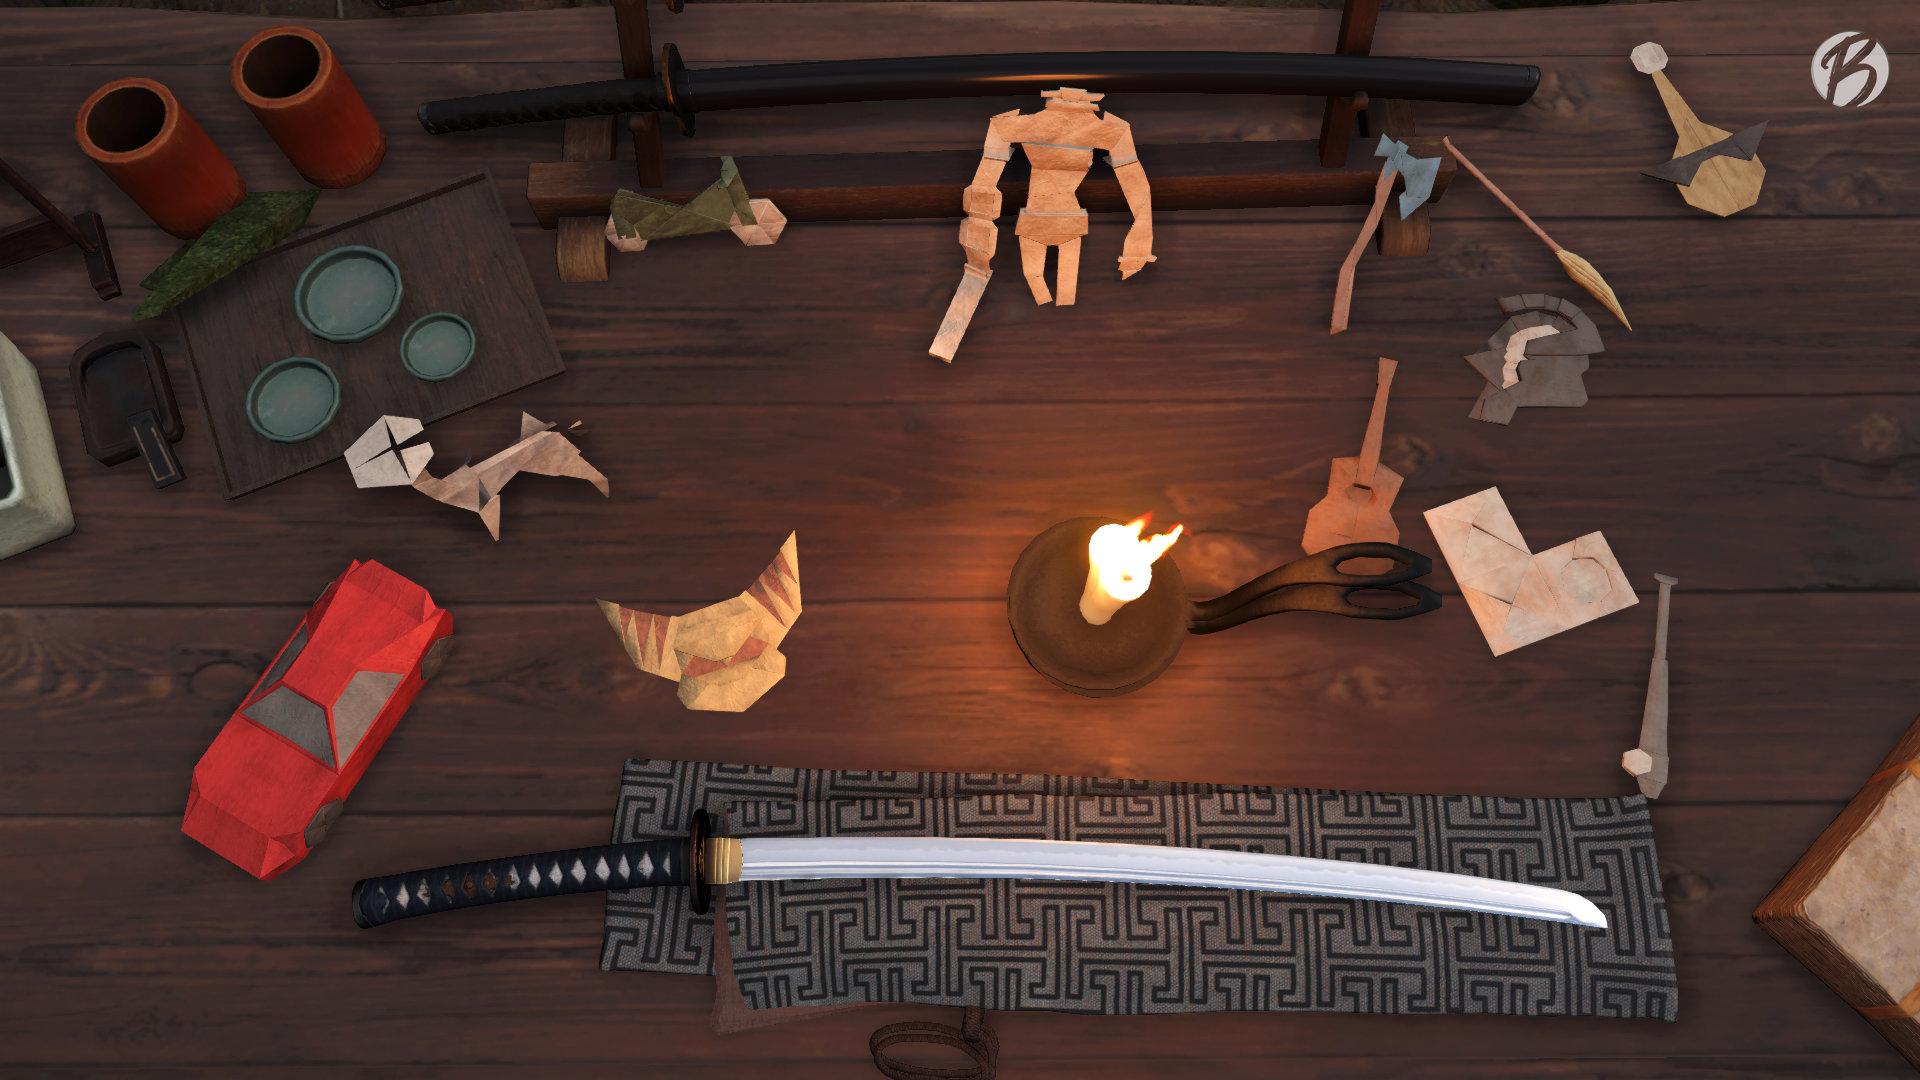 Ghost of Tsushima - Origami Figuren bekannter Studios und PlayStation Exklusivtitel.